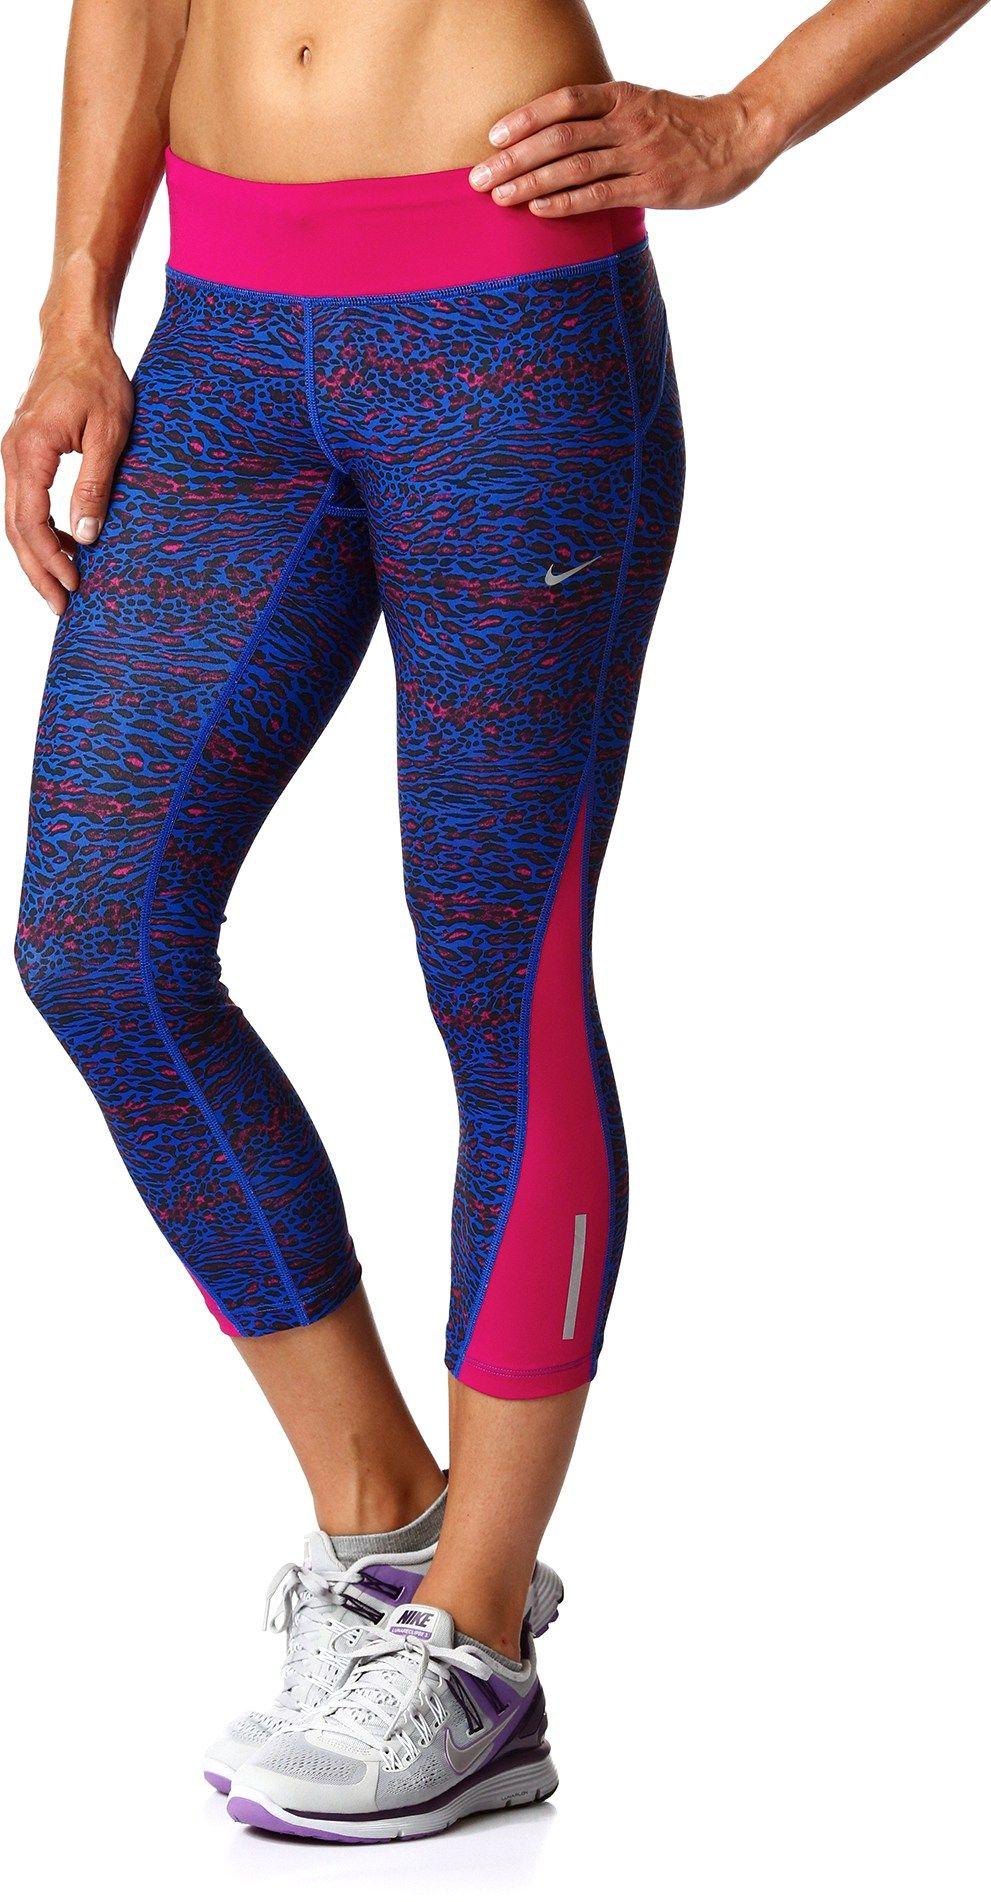 77ffdf5f70d22a Nike Female Racer Leopard Print Crop Tights - Women's | *Apparel ...